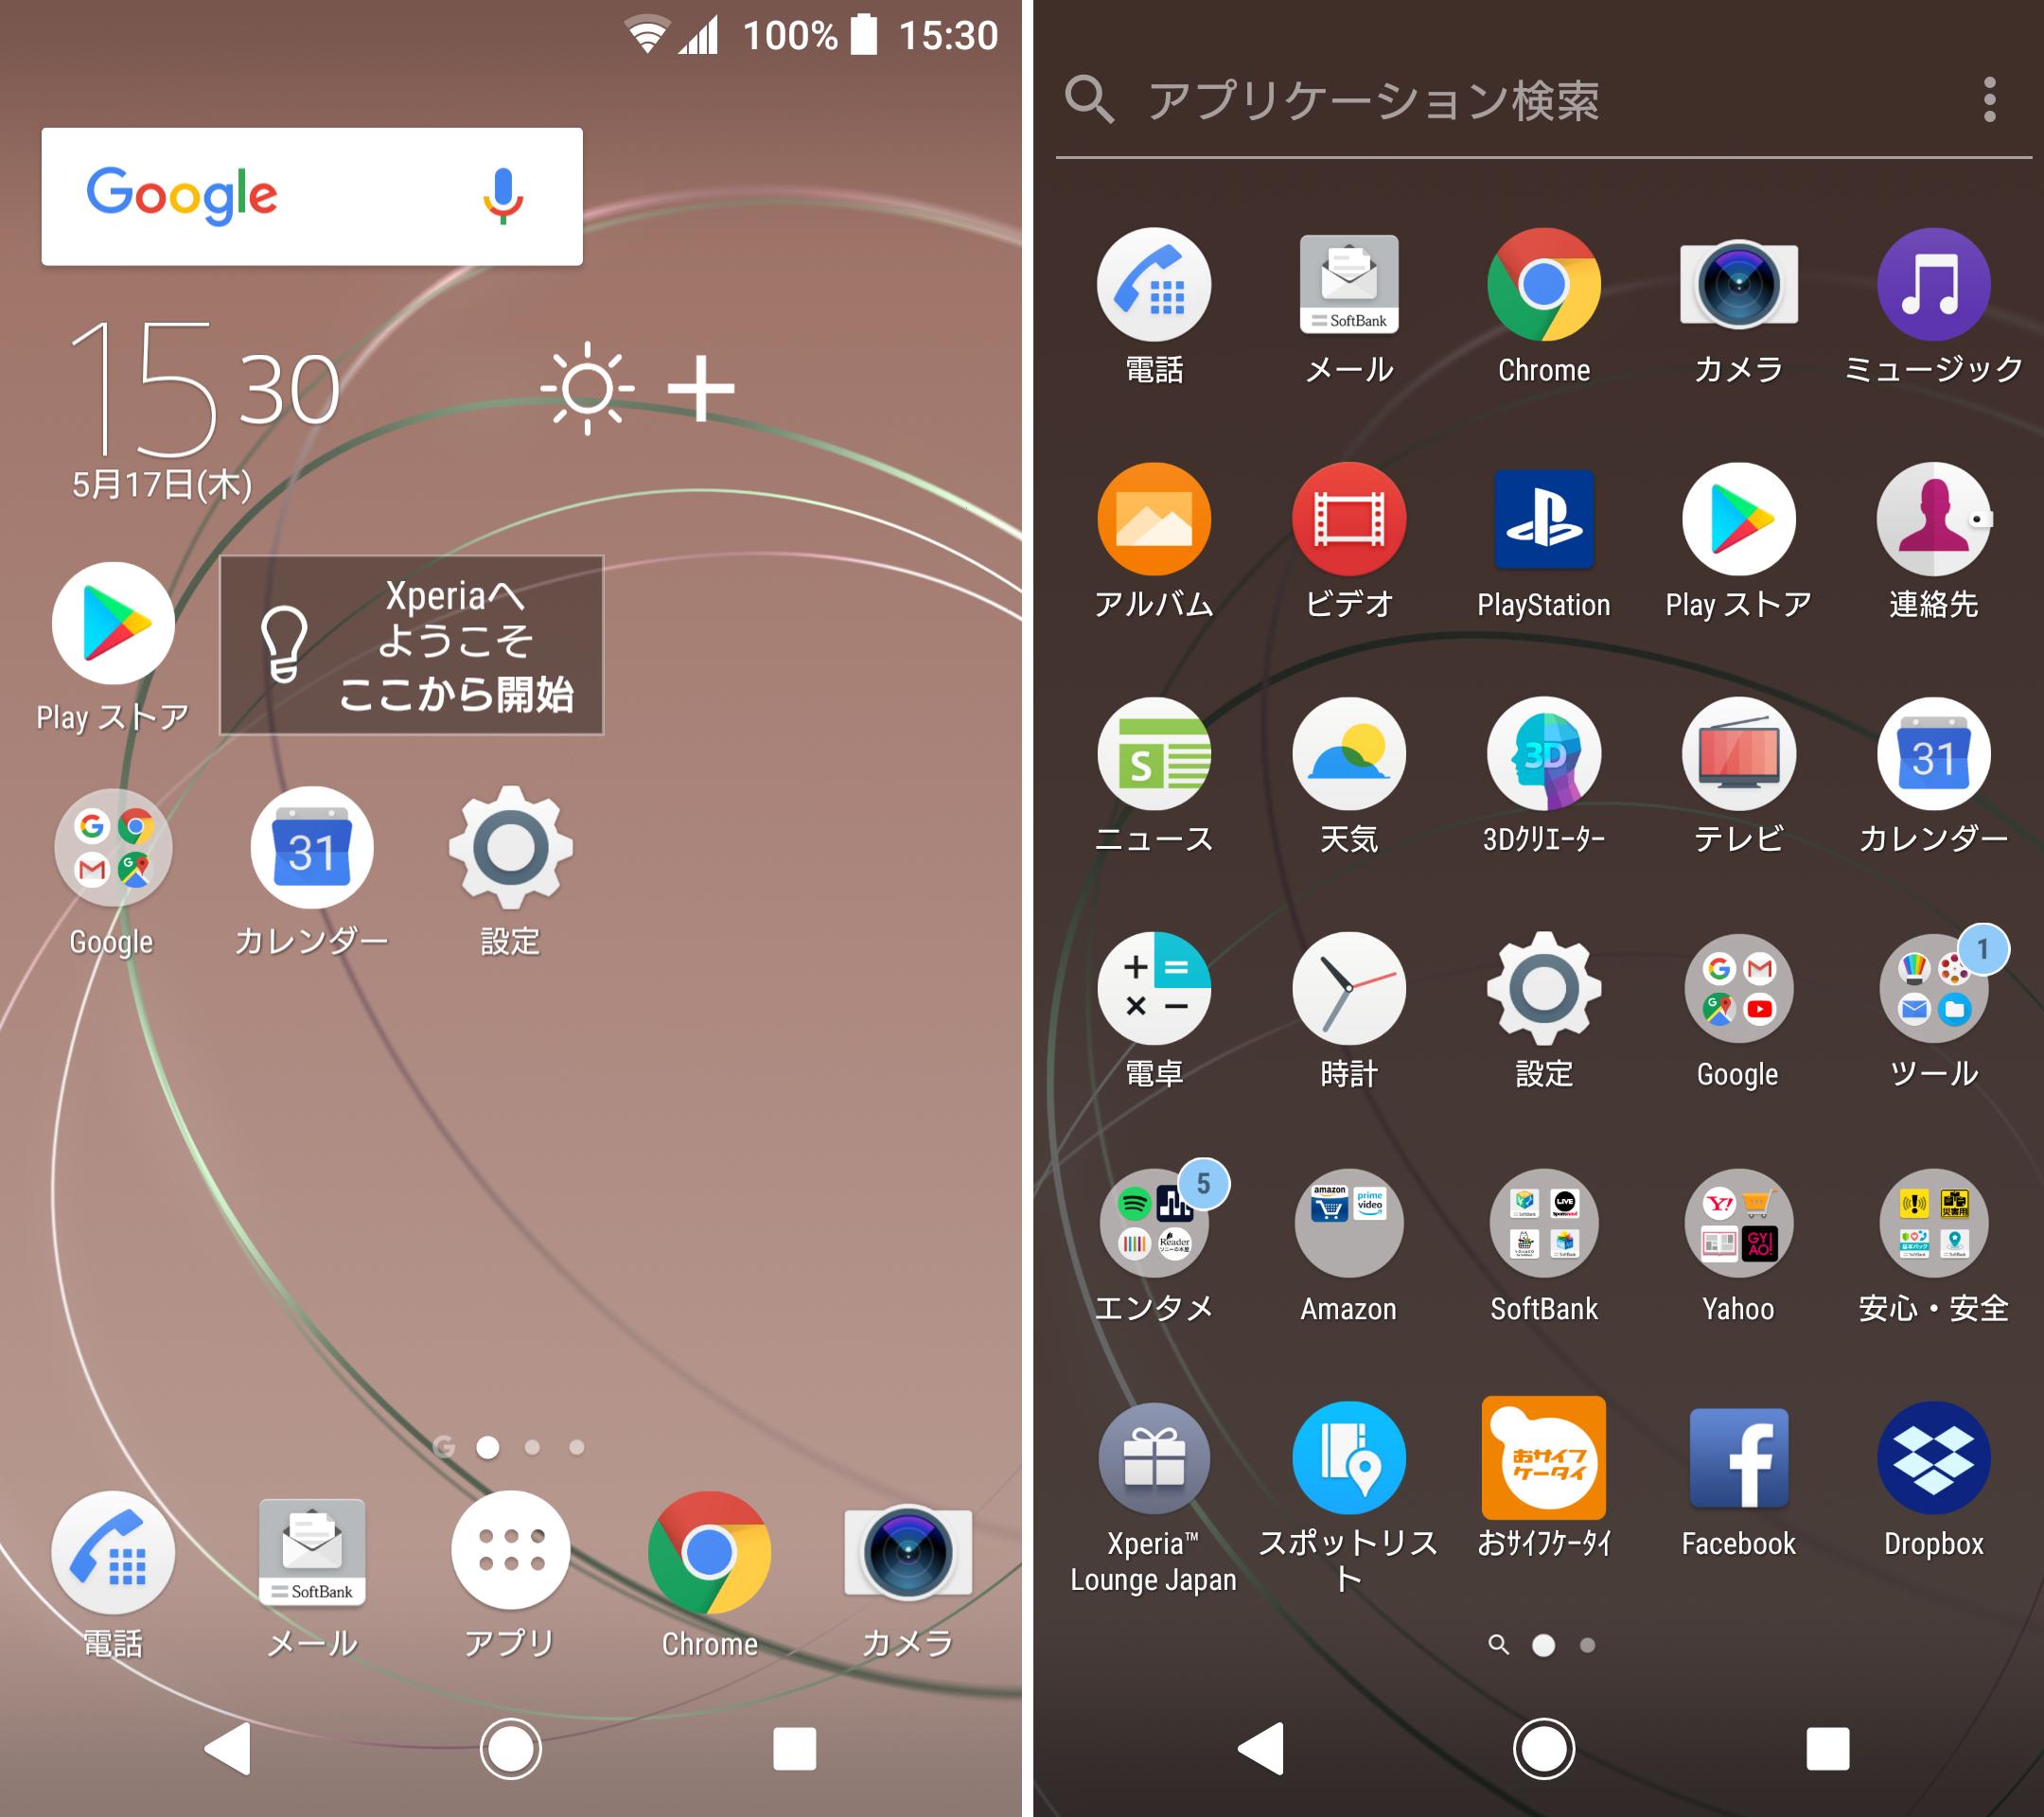 Xperiaでホーム画面を自分好みにカスタマイズする方法 Xperia Tips Engadget 日本版